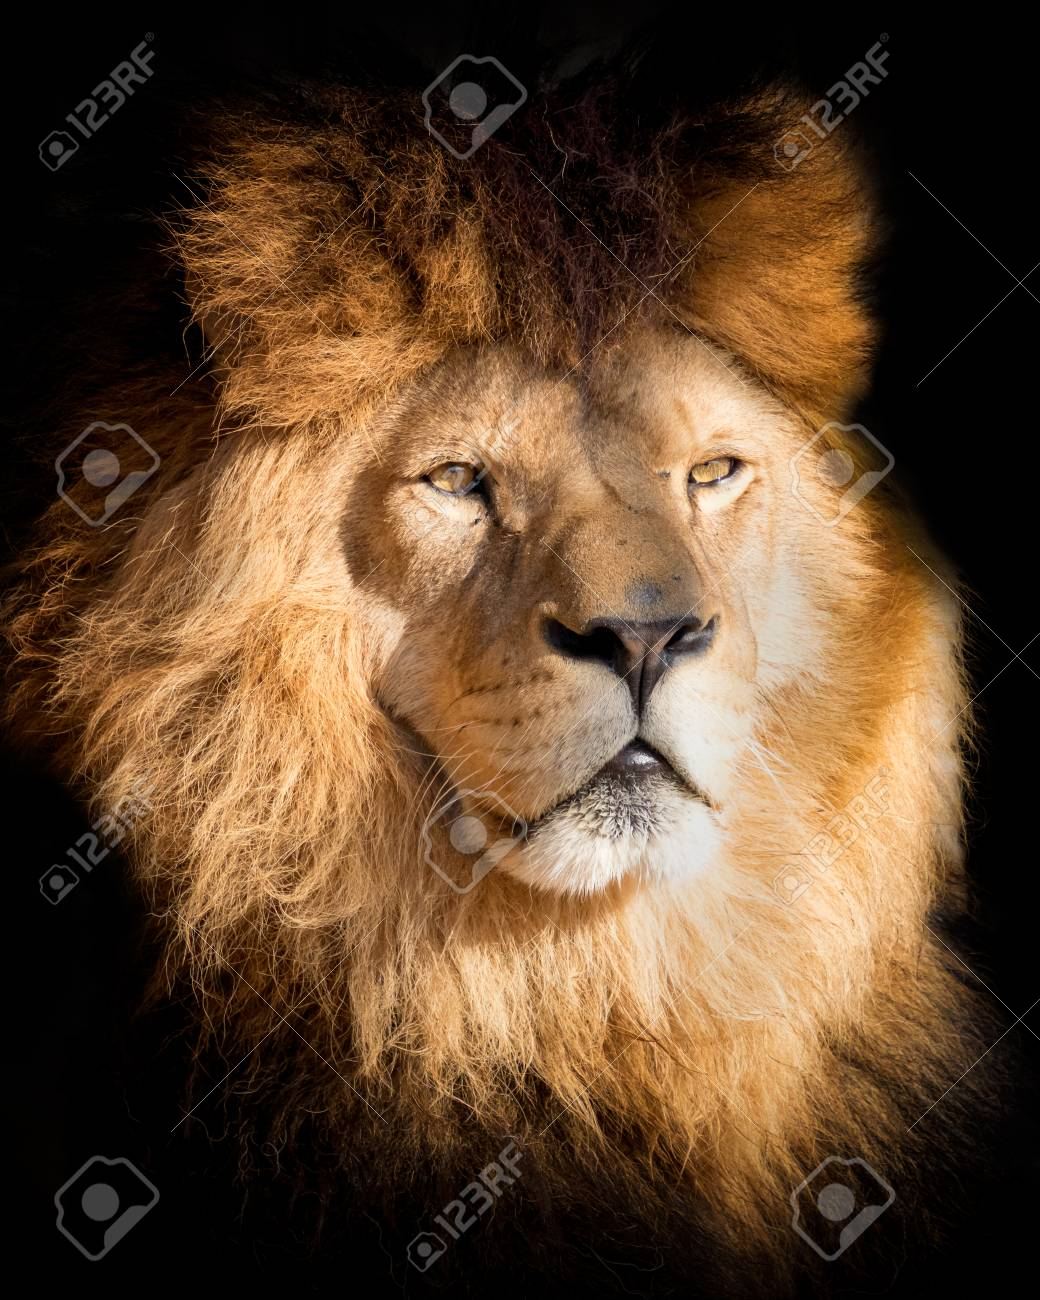 Detail portrait lion in black. Poster lion in high quality. Popular a endangered animal. - 123634112